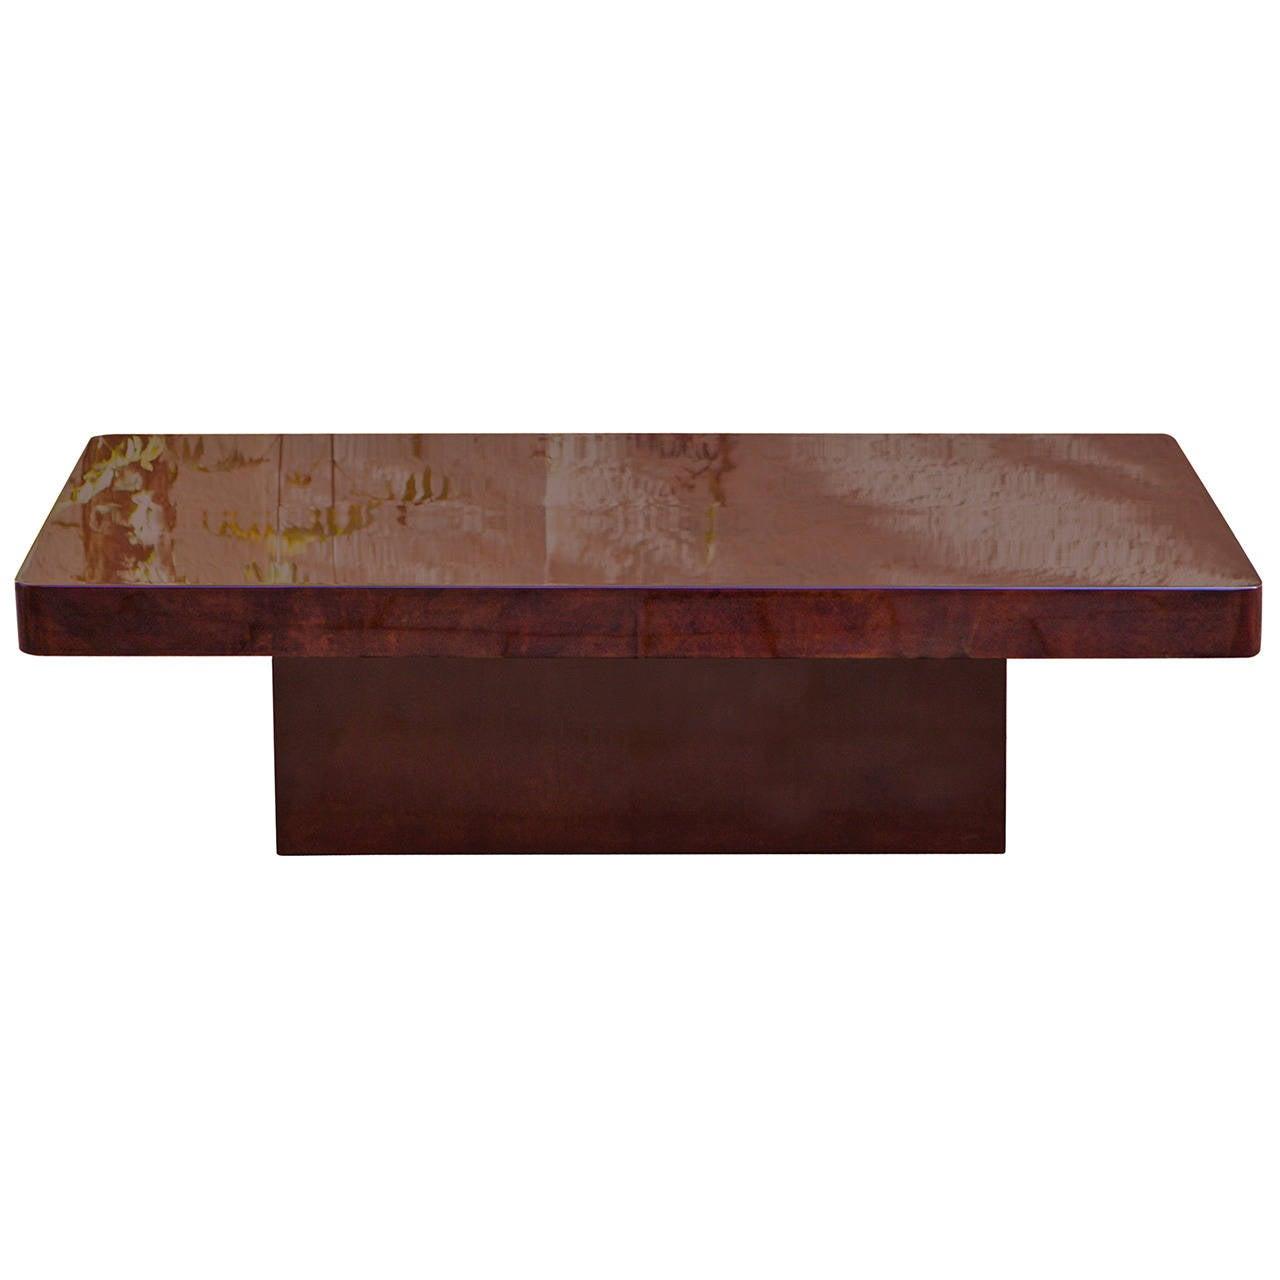 Modern aldo tura red goatskin coffee table at 1stdibs for Red modern coffee table